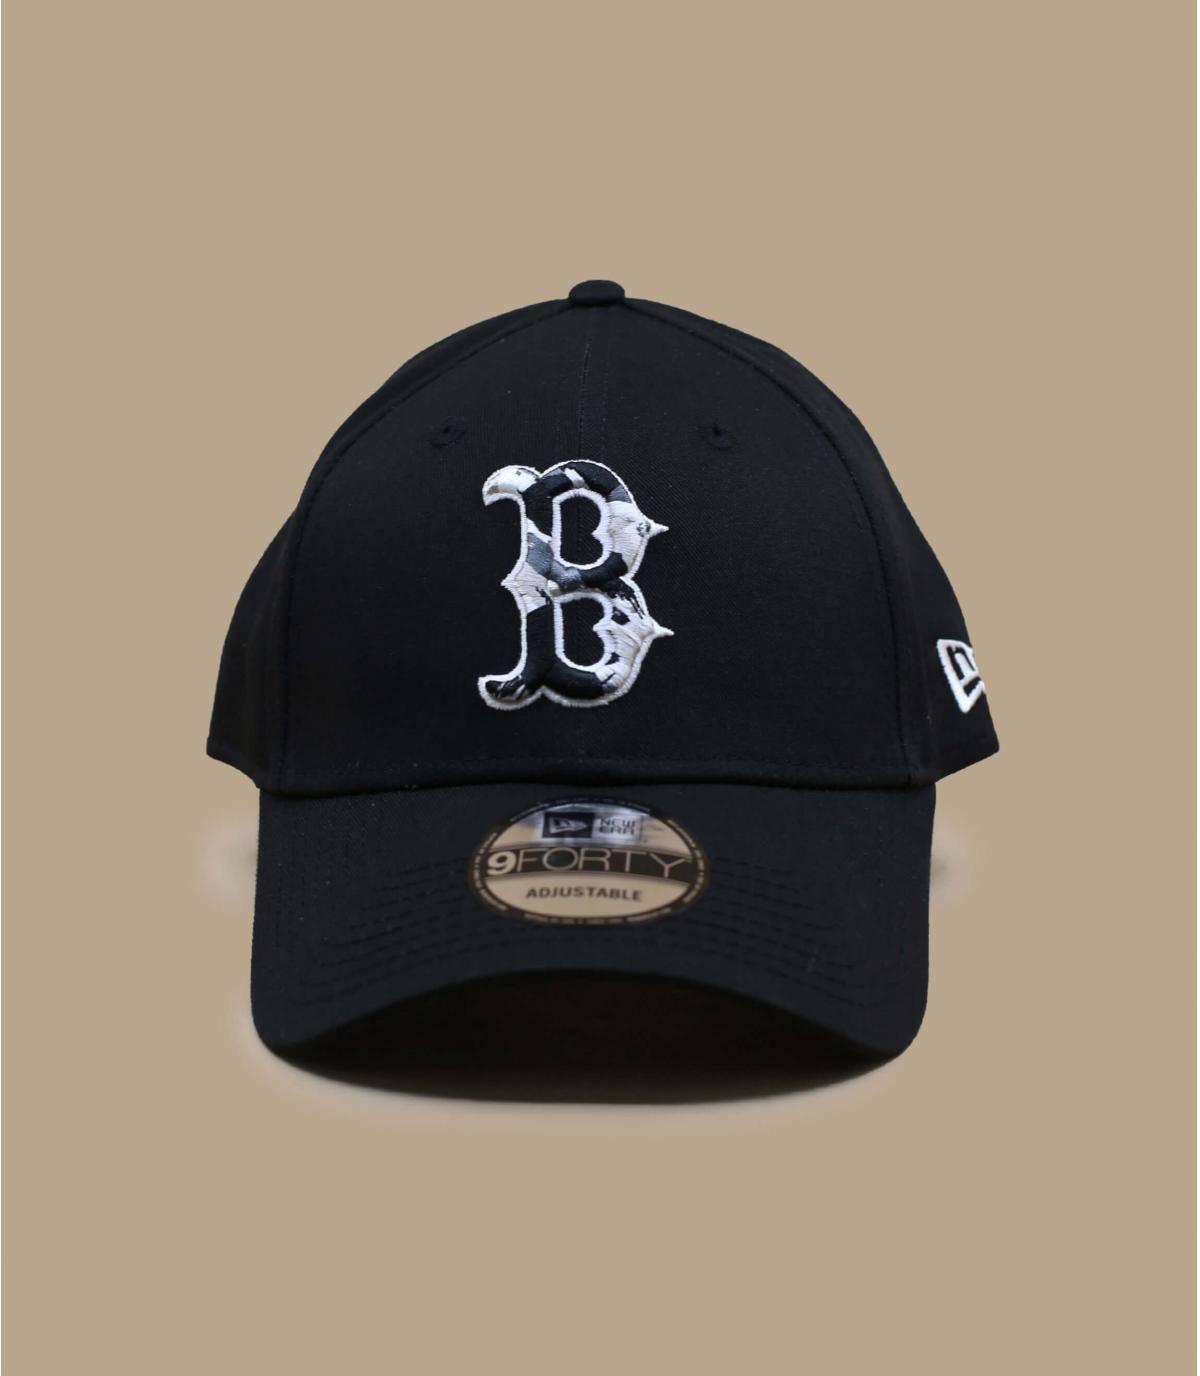 Details Camo Infill 940 Boston black - afbeeling 2